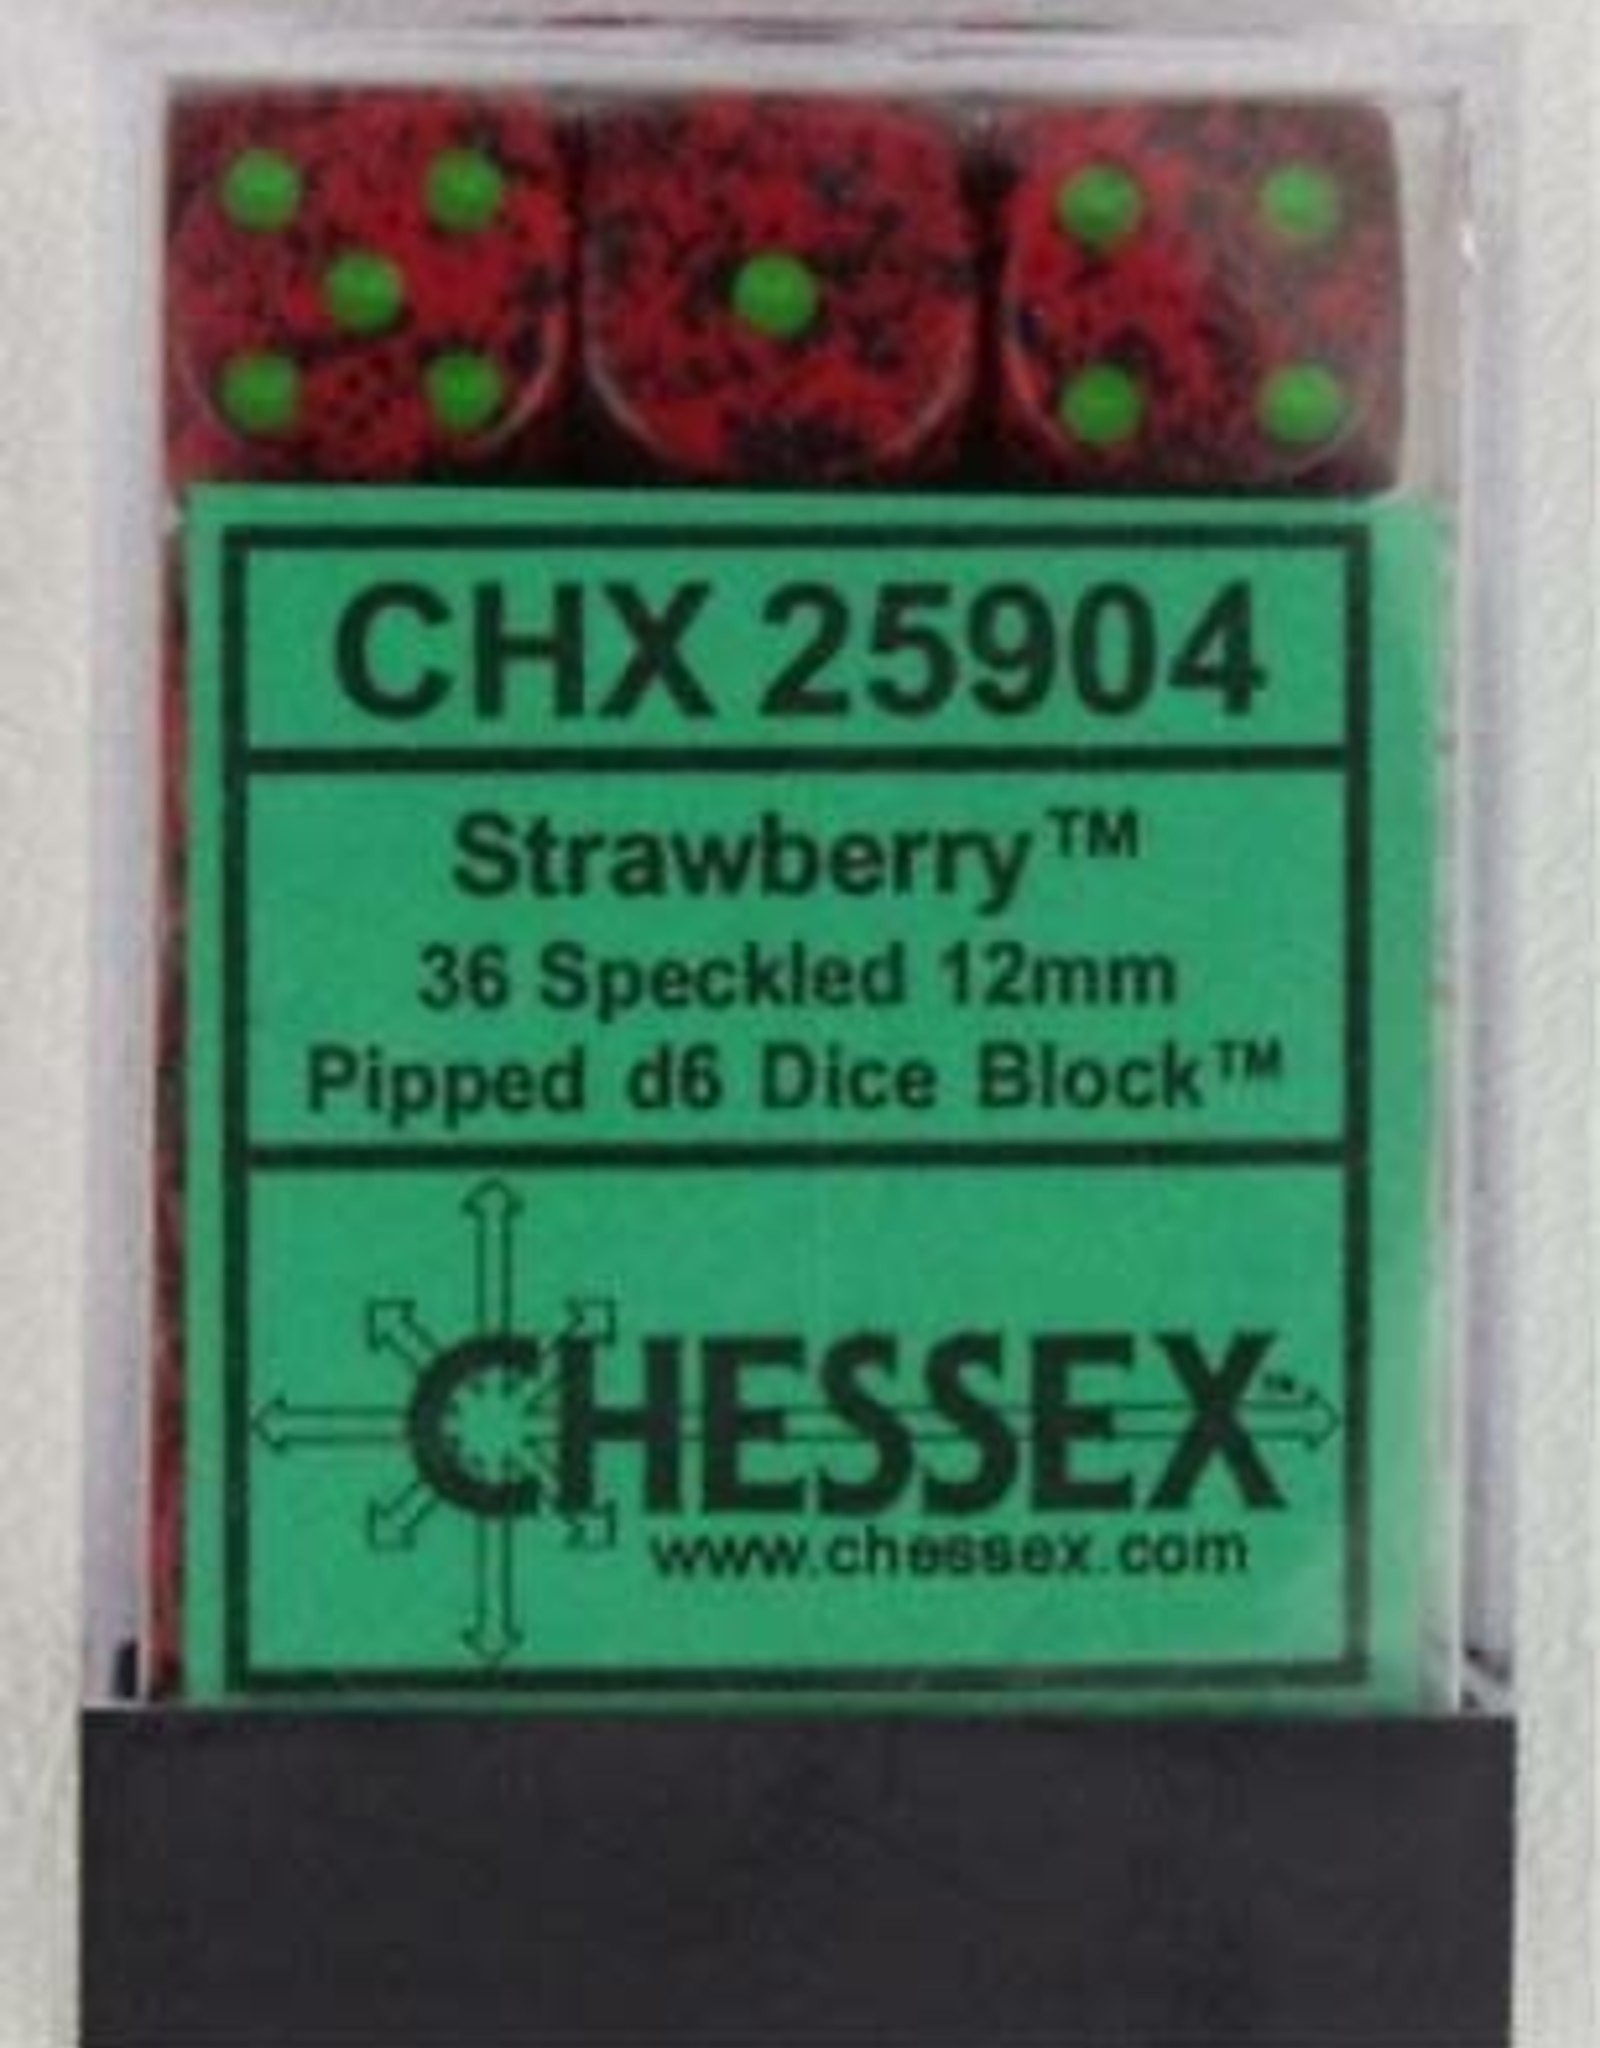 CHX 25904  Speckled 'Strawberry'